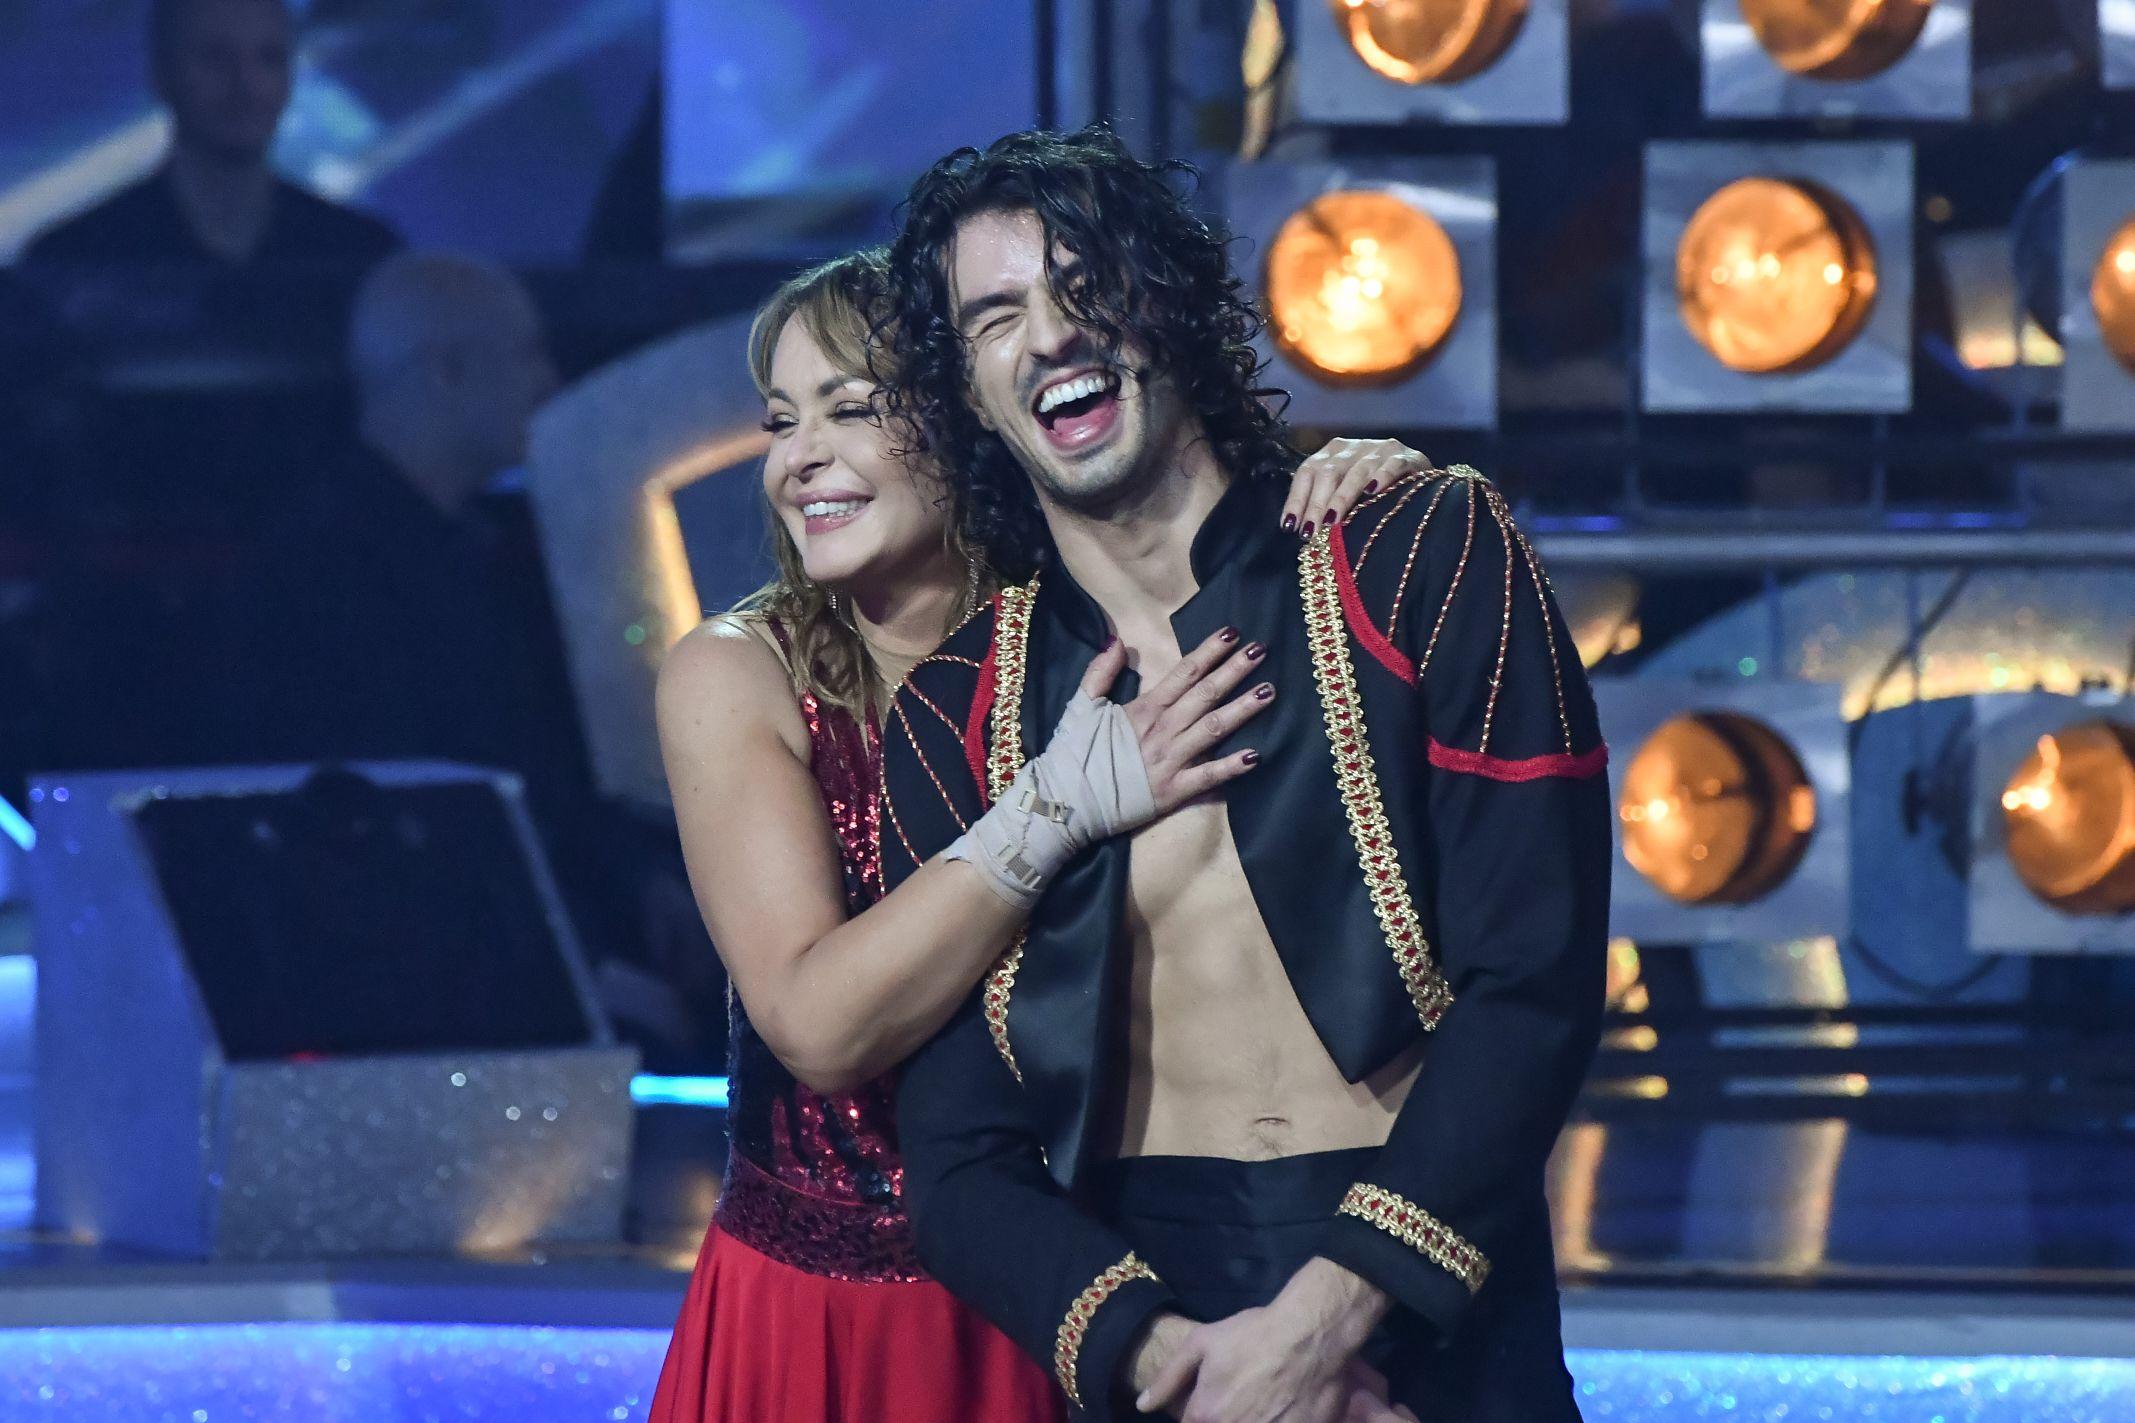 Andrei Mangra és Gabriela spanic